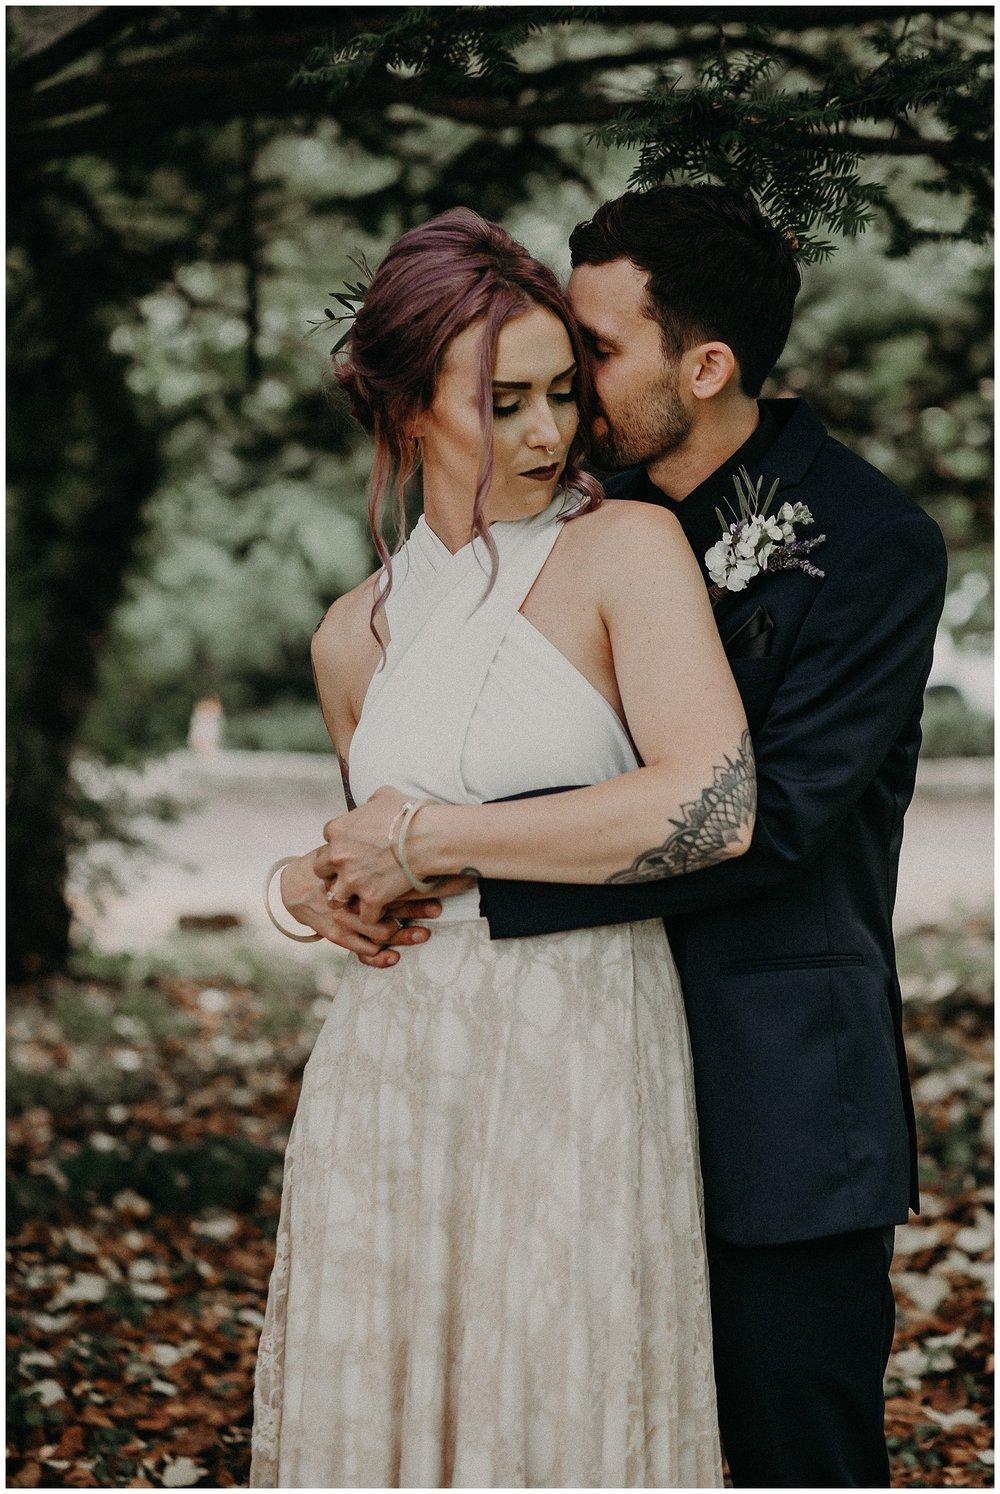 Outdoor Summer Boho Wedding at Ridgeland Manion in Downtown Philadelphia Pennsylvania_0081.jpg